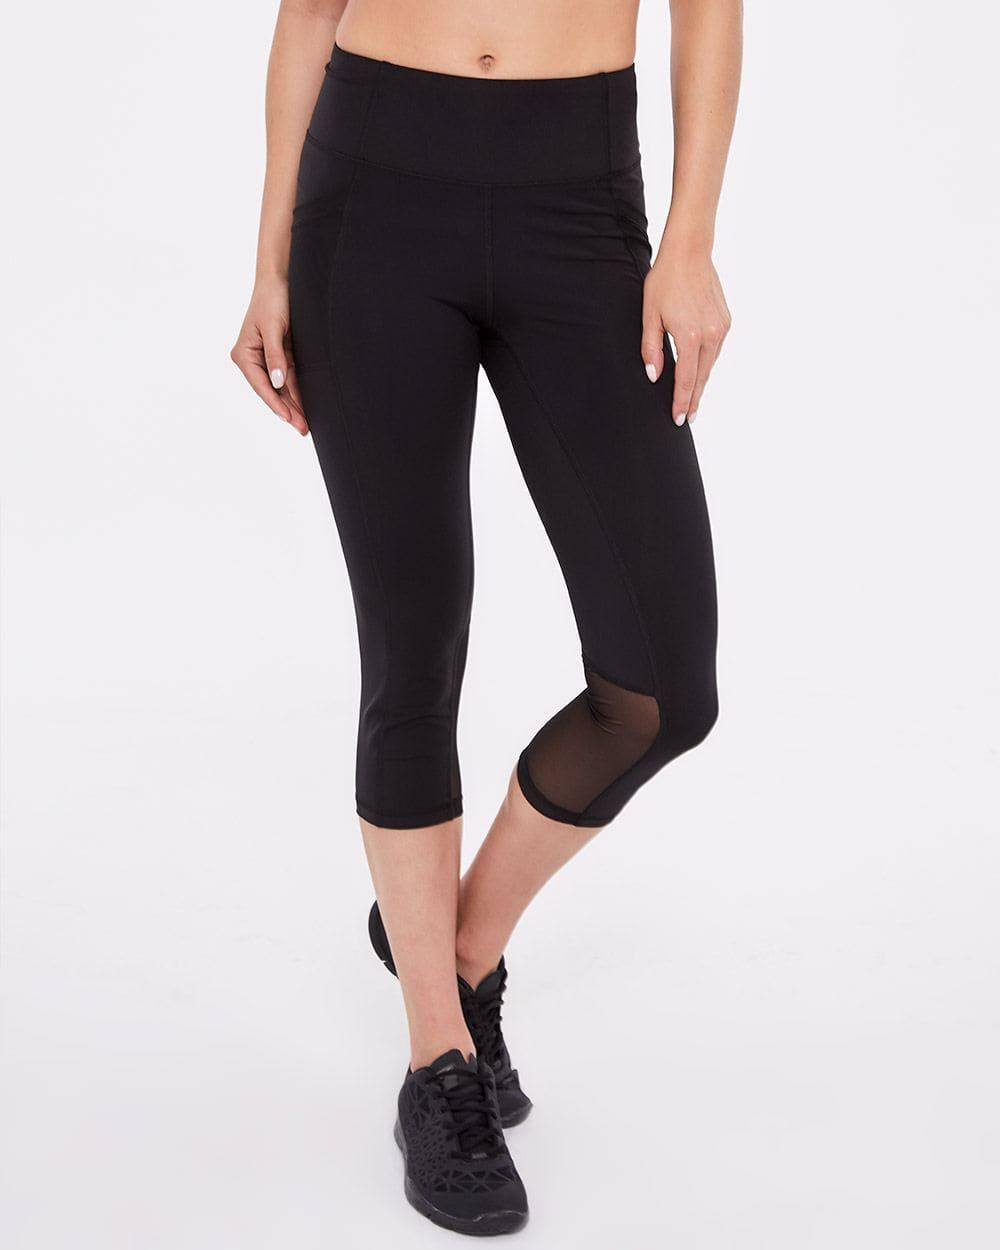 Hyba Levity Capri Legging